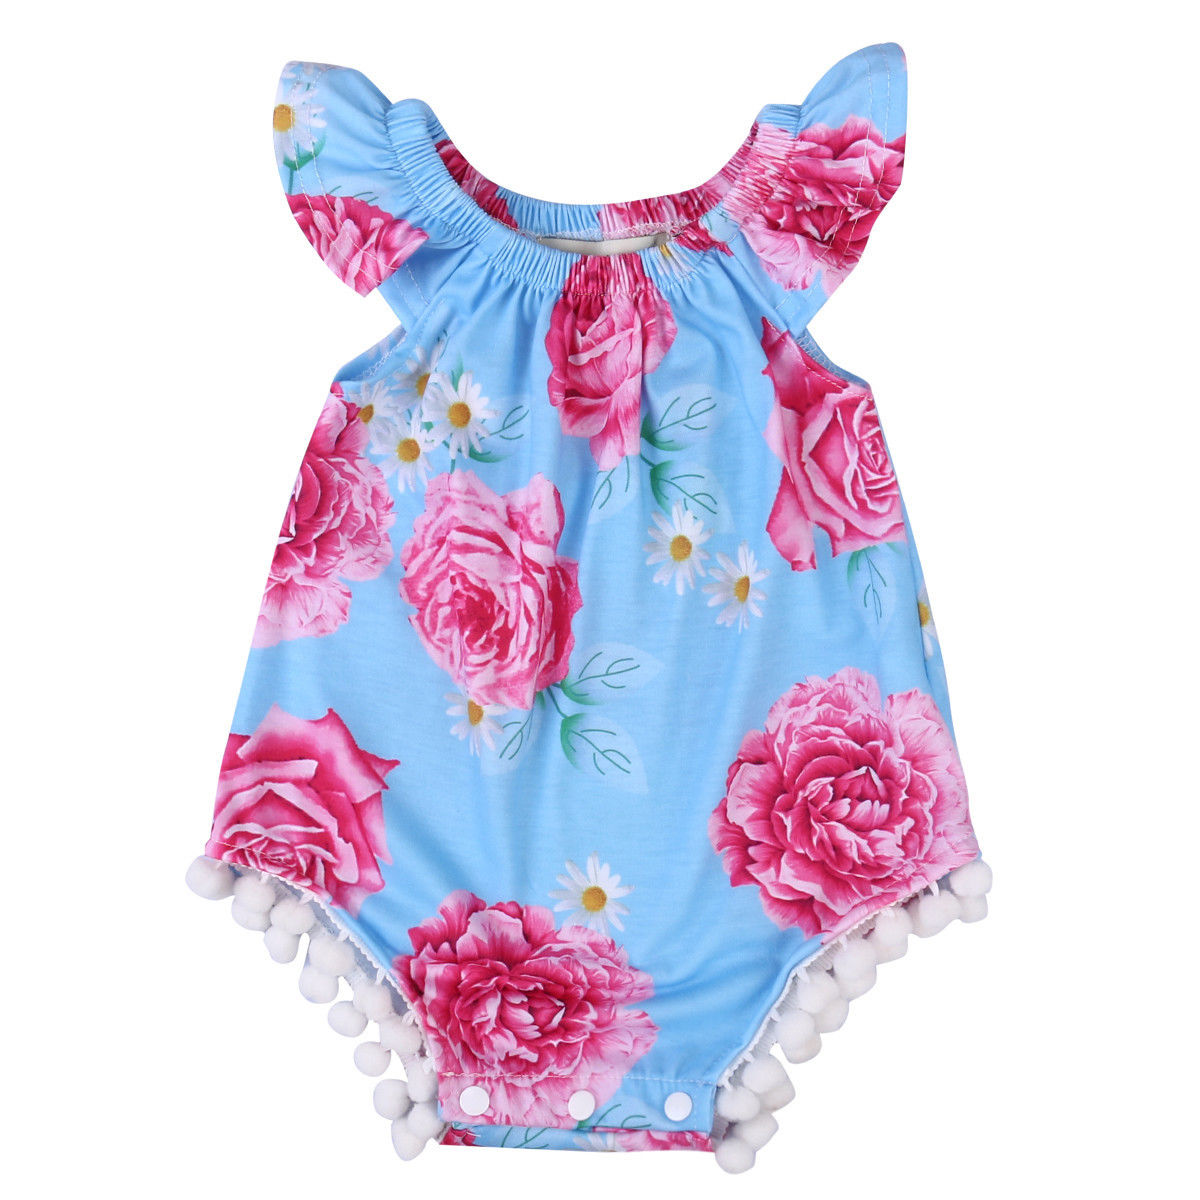 2017 new summer infant toddler flower cute Newborn Baby Girls Floral Romper Jumpsuit Kids Clothes Outfit Sunsuit t shirt